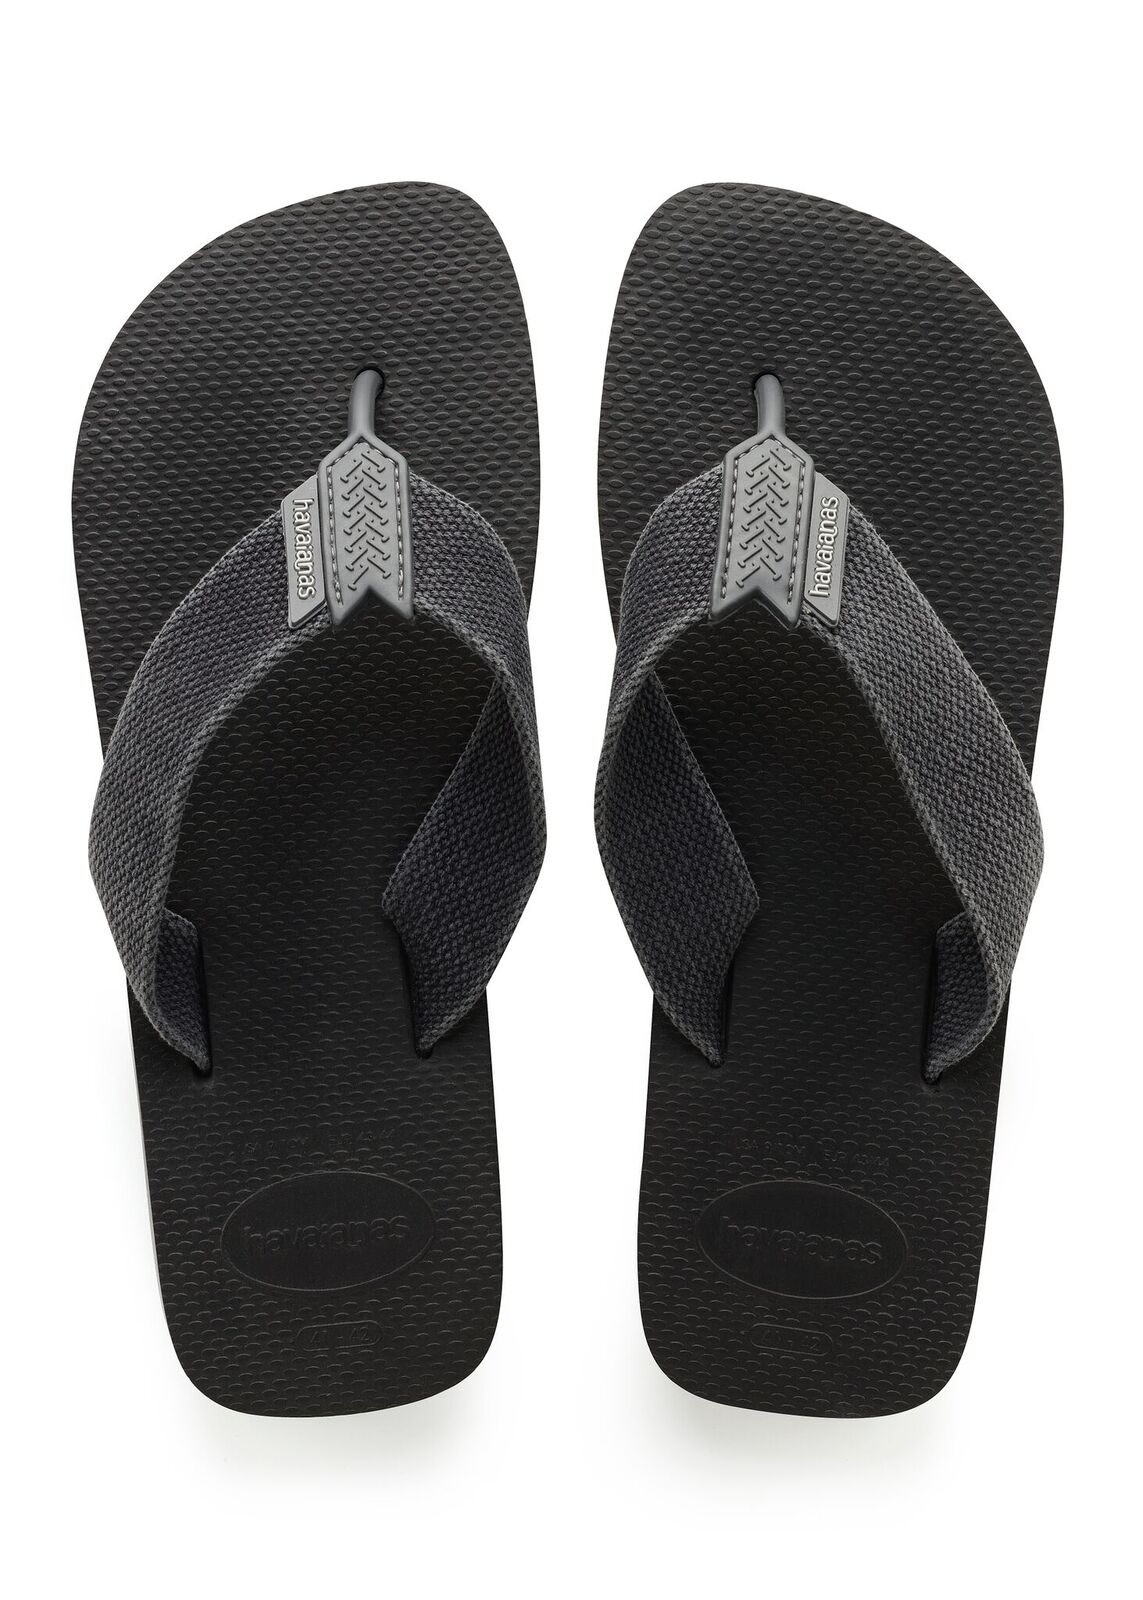 0846e10dd35 Urban Basic - Havaianas - Mens Footwear-Jandals   Mariposa Clothing ...